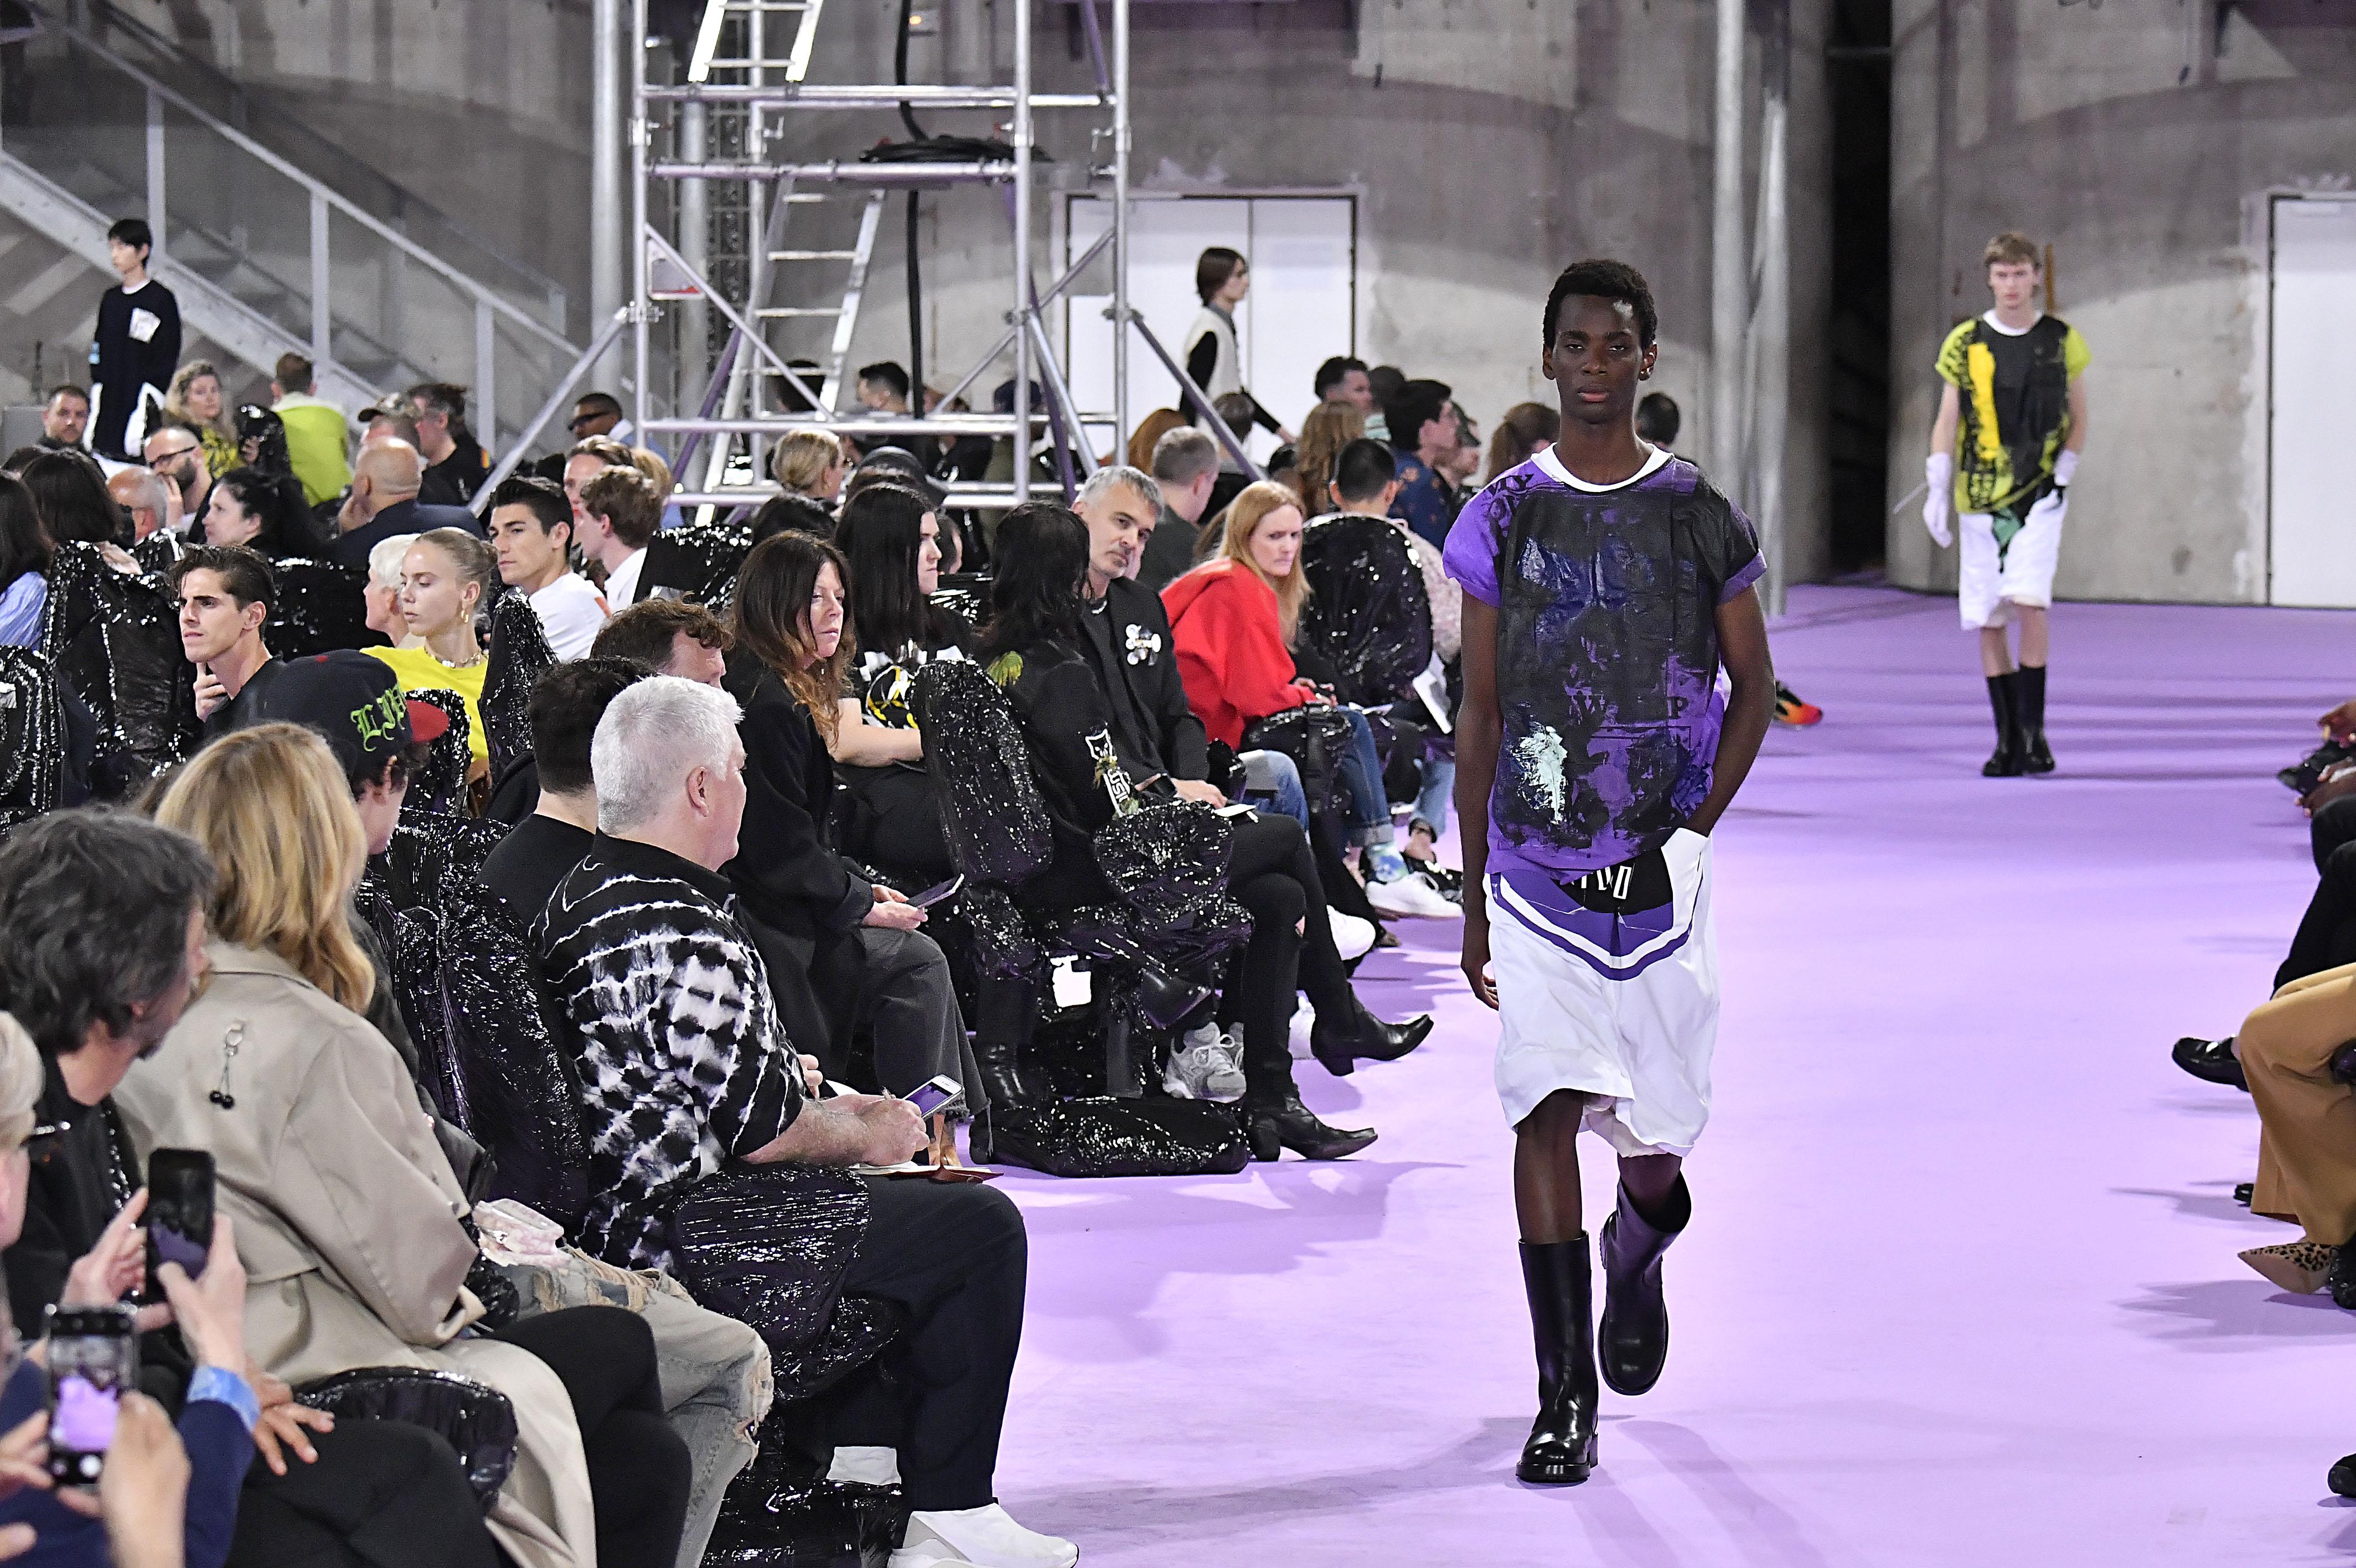 b0ecbf75e1fbe Men's Fashion Week highlights - CNN Style